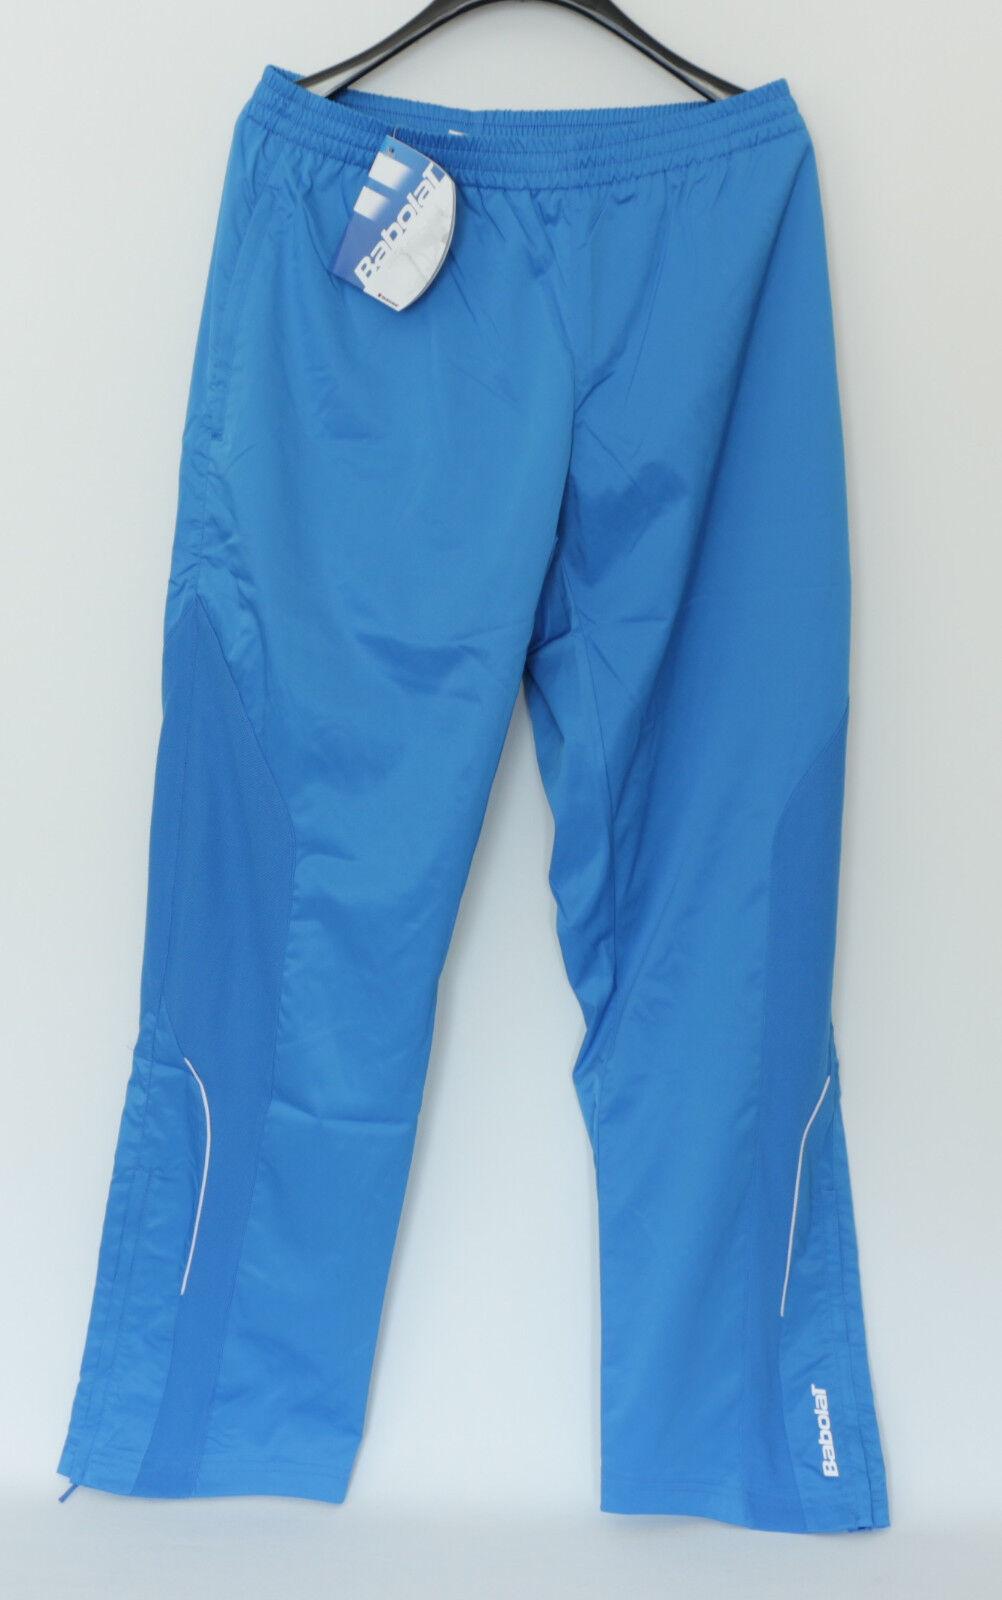 Asics Damen Sport Shirt motiondry neuwertig